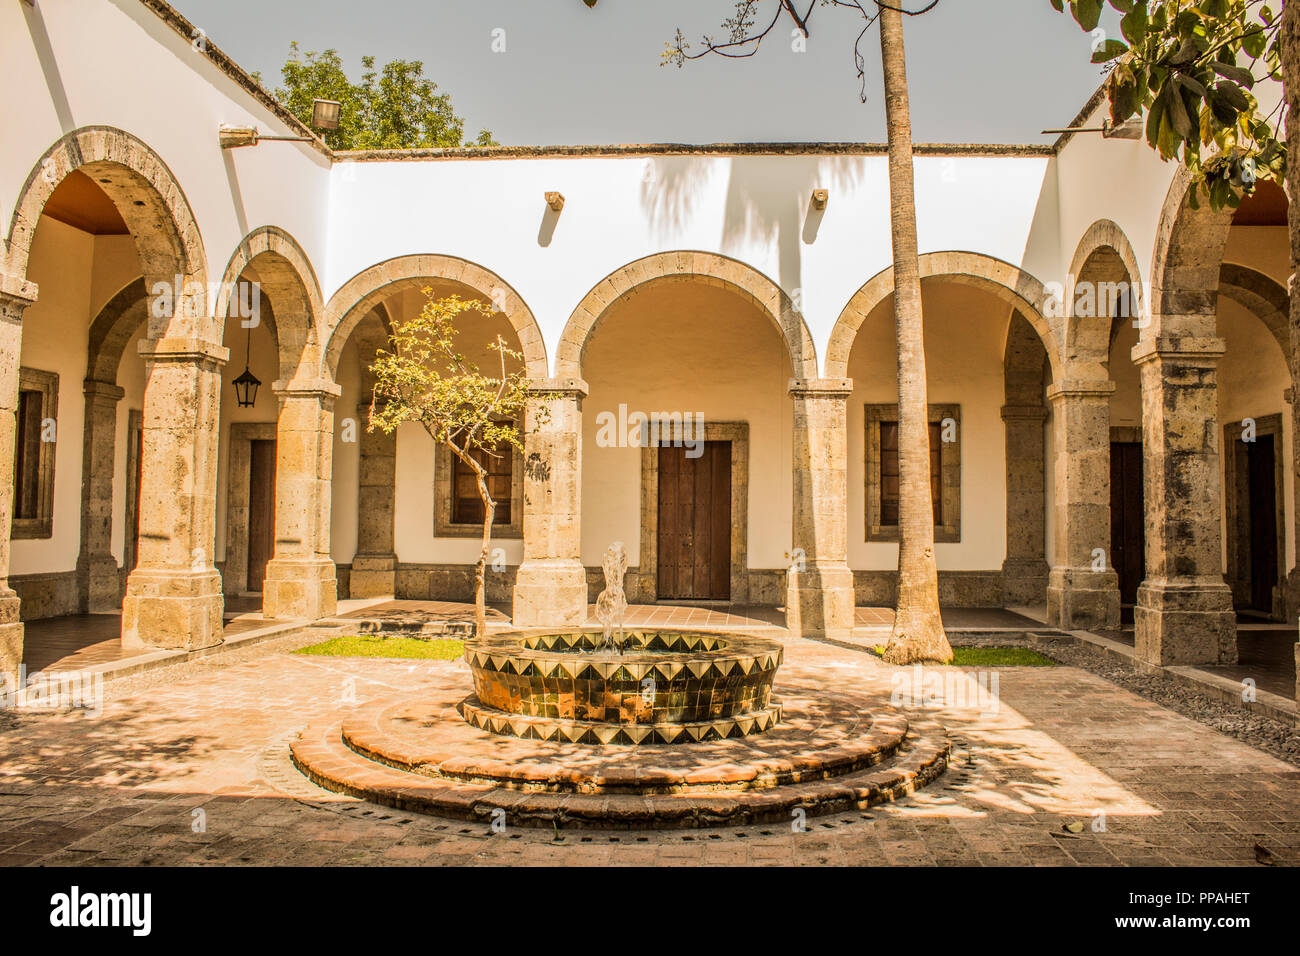 Innenhof des Cultural Cabanas in Guadalajara, Jalisco, Mexiko Stockbild